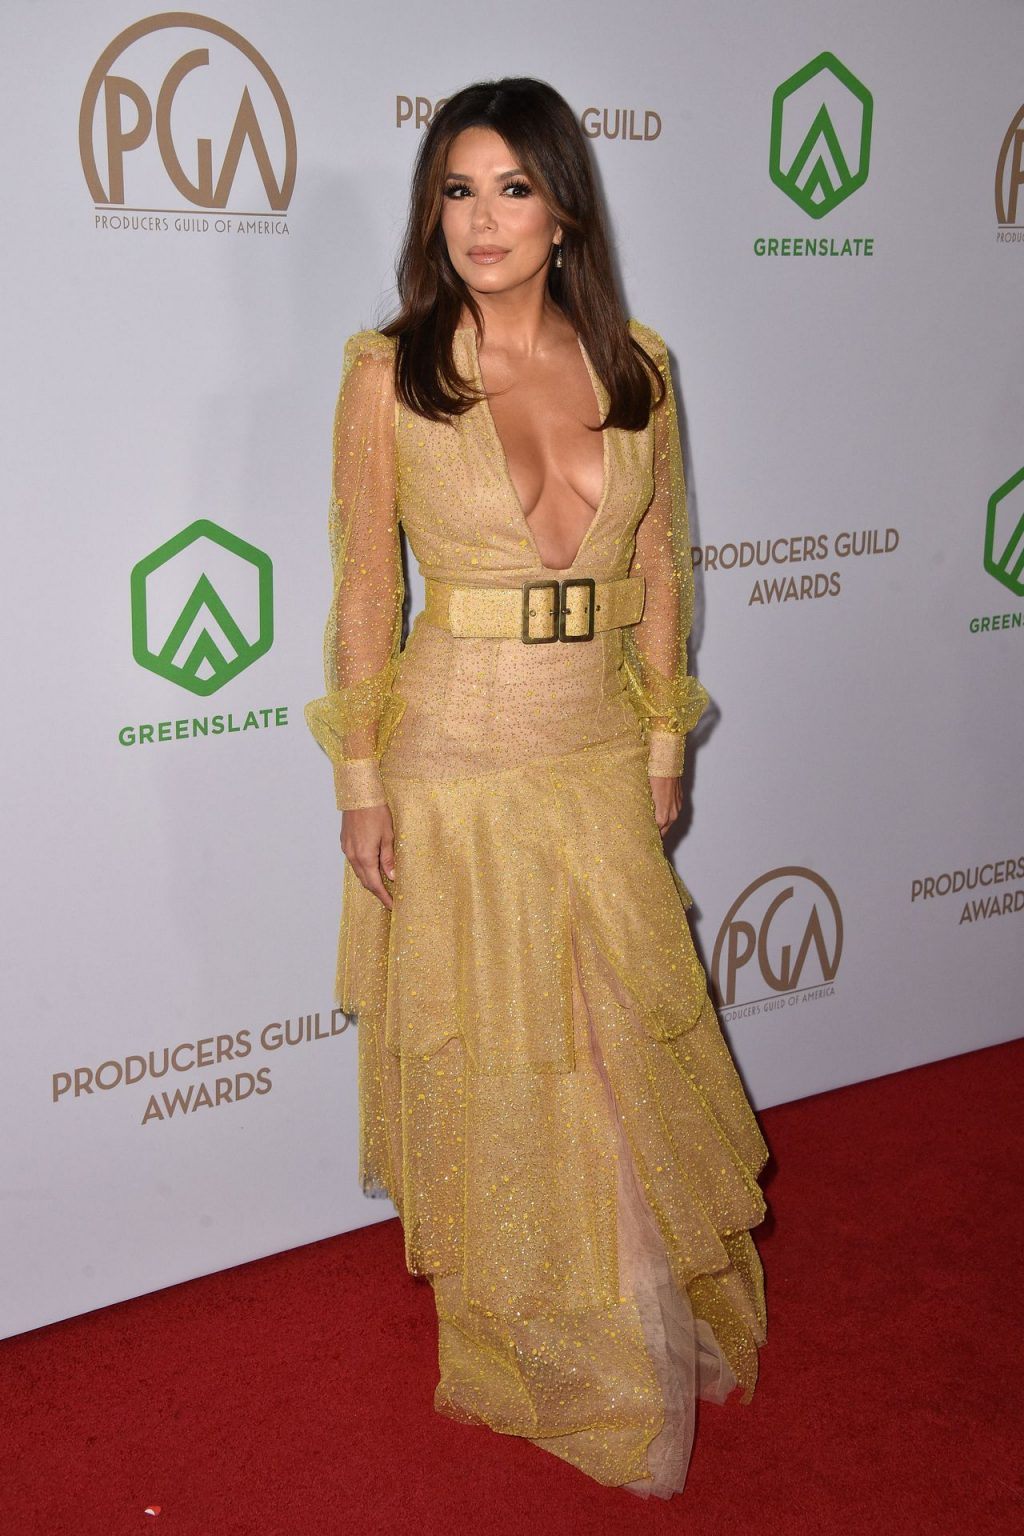 Eva Longoria Displays Her Cleavage at the Producers Guild Awards (25 Photos)